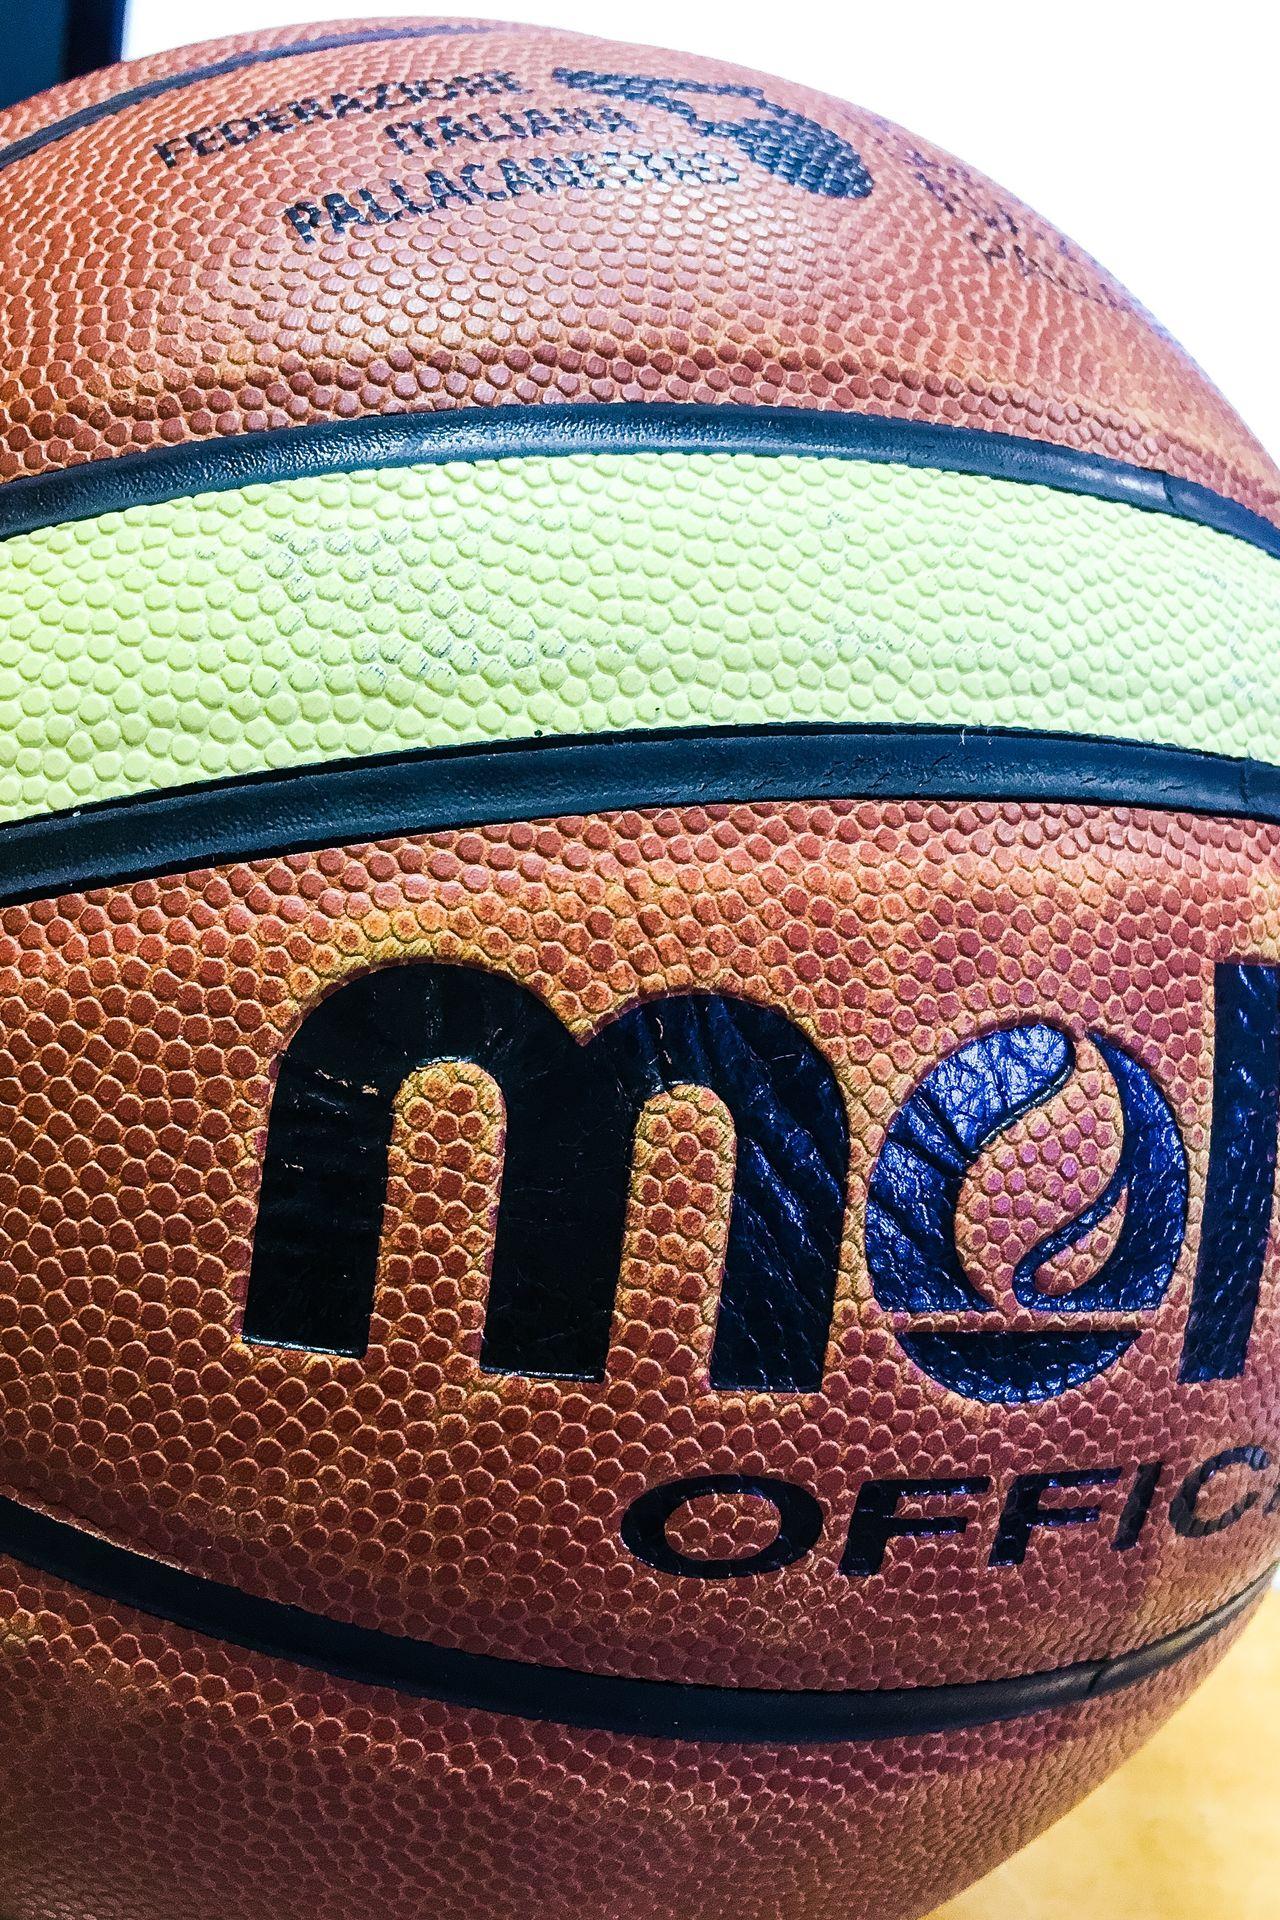 Lines of basketball Ball Basket Basketball Basketball Is Life Basketball ❤ Game Ball Leather Legnano Basket Knights Molten No People Pallacanestro Pallone Pelle